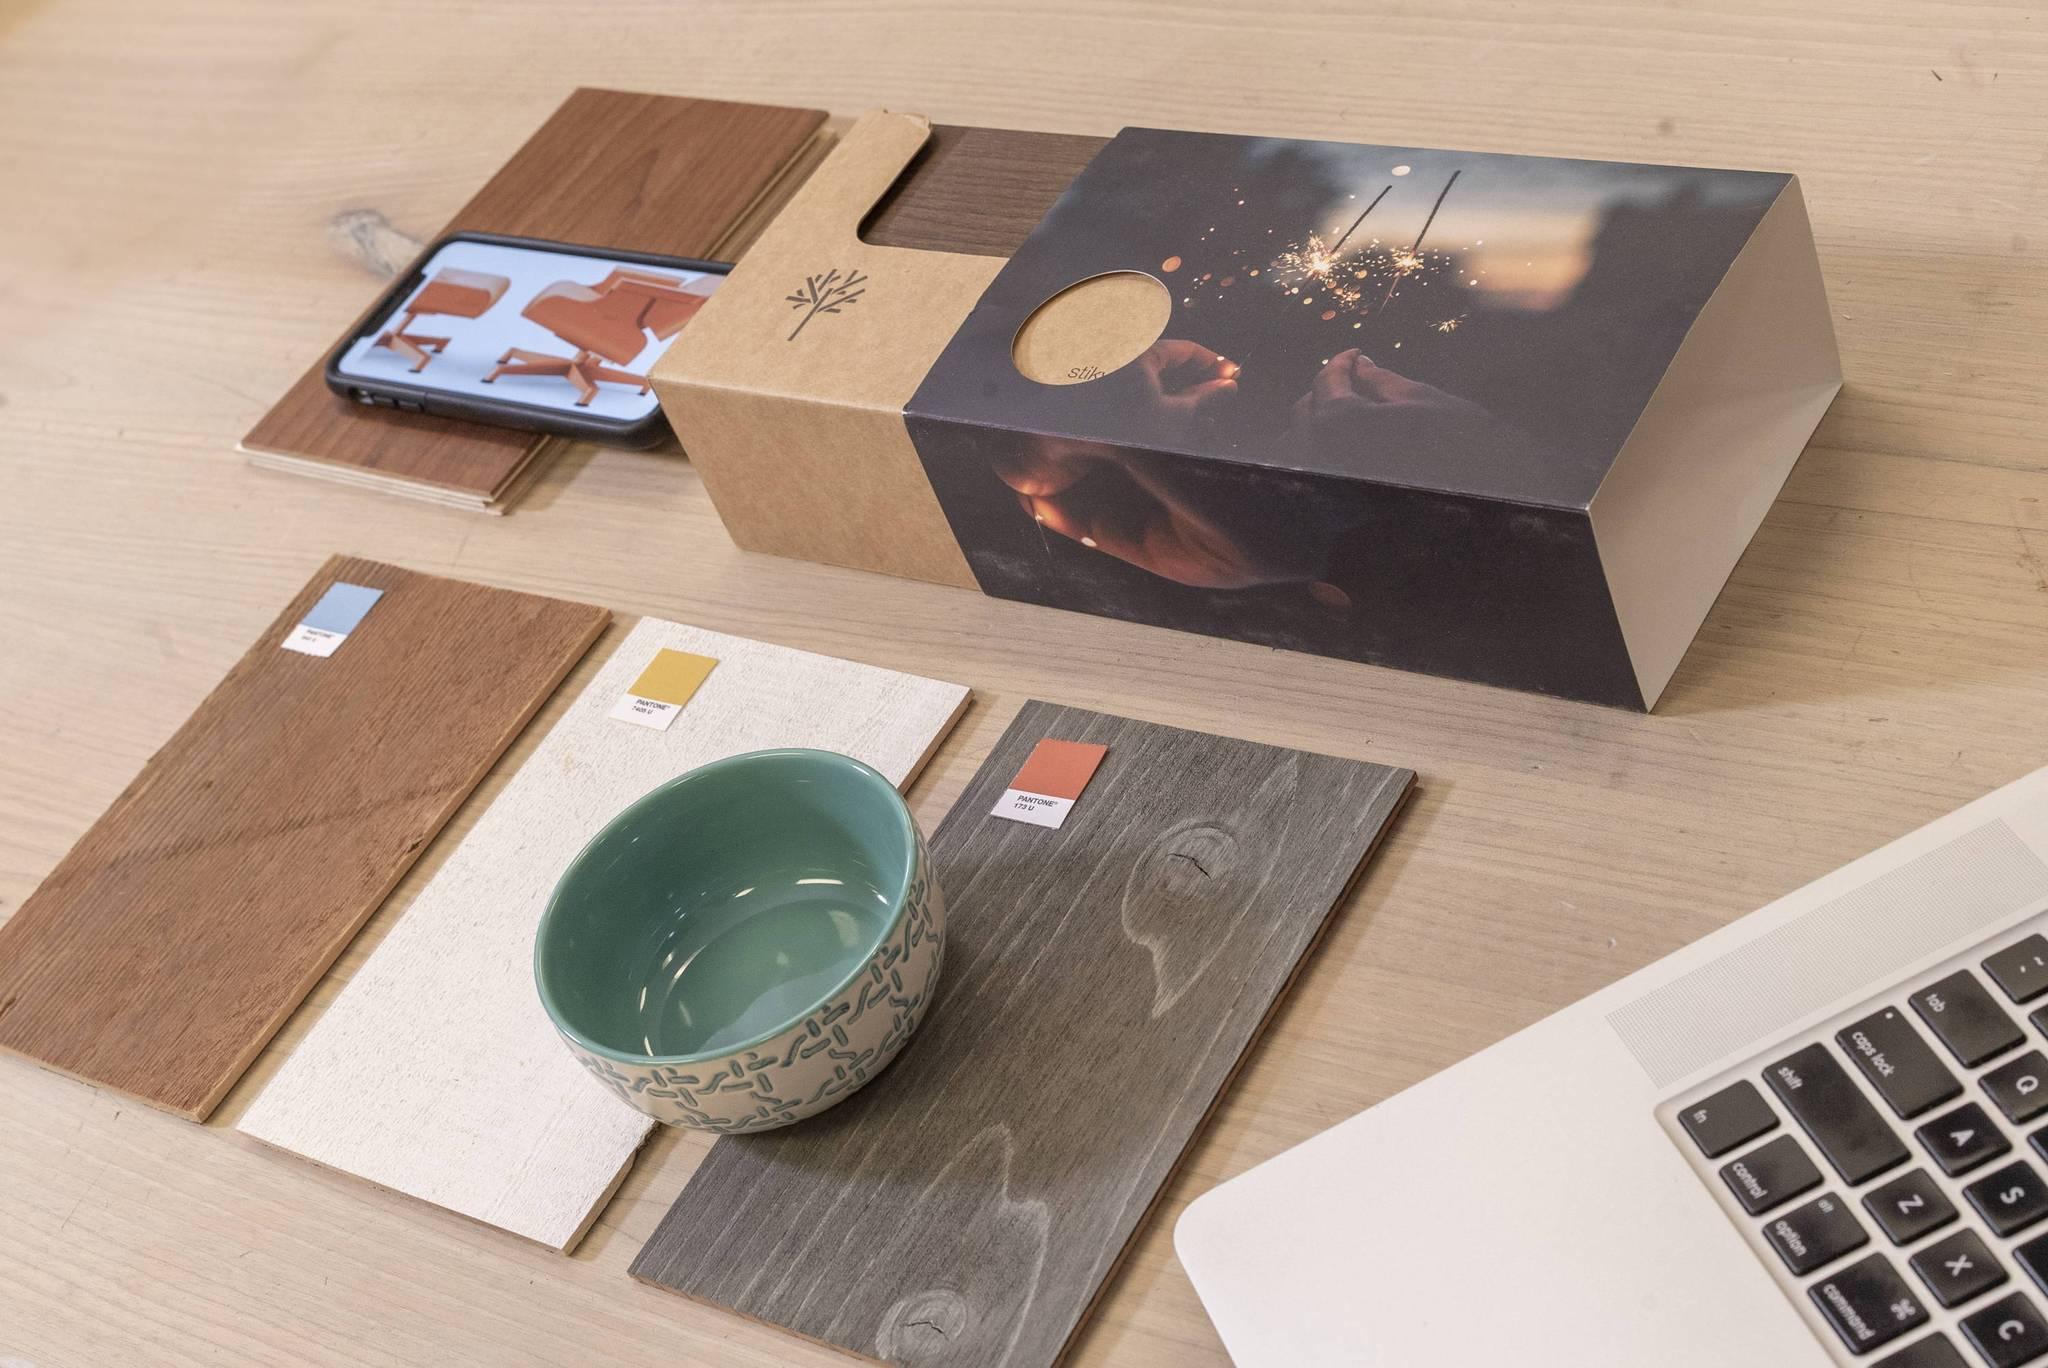 Design palette using stikwood and other design elements.